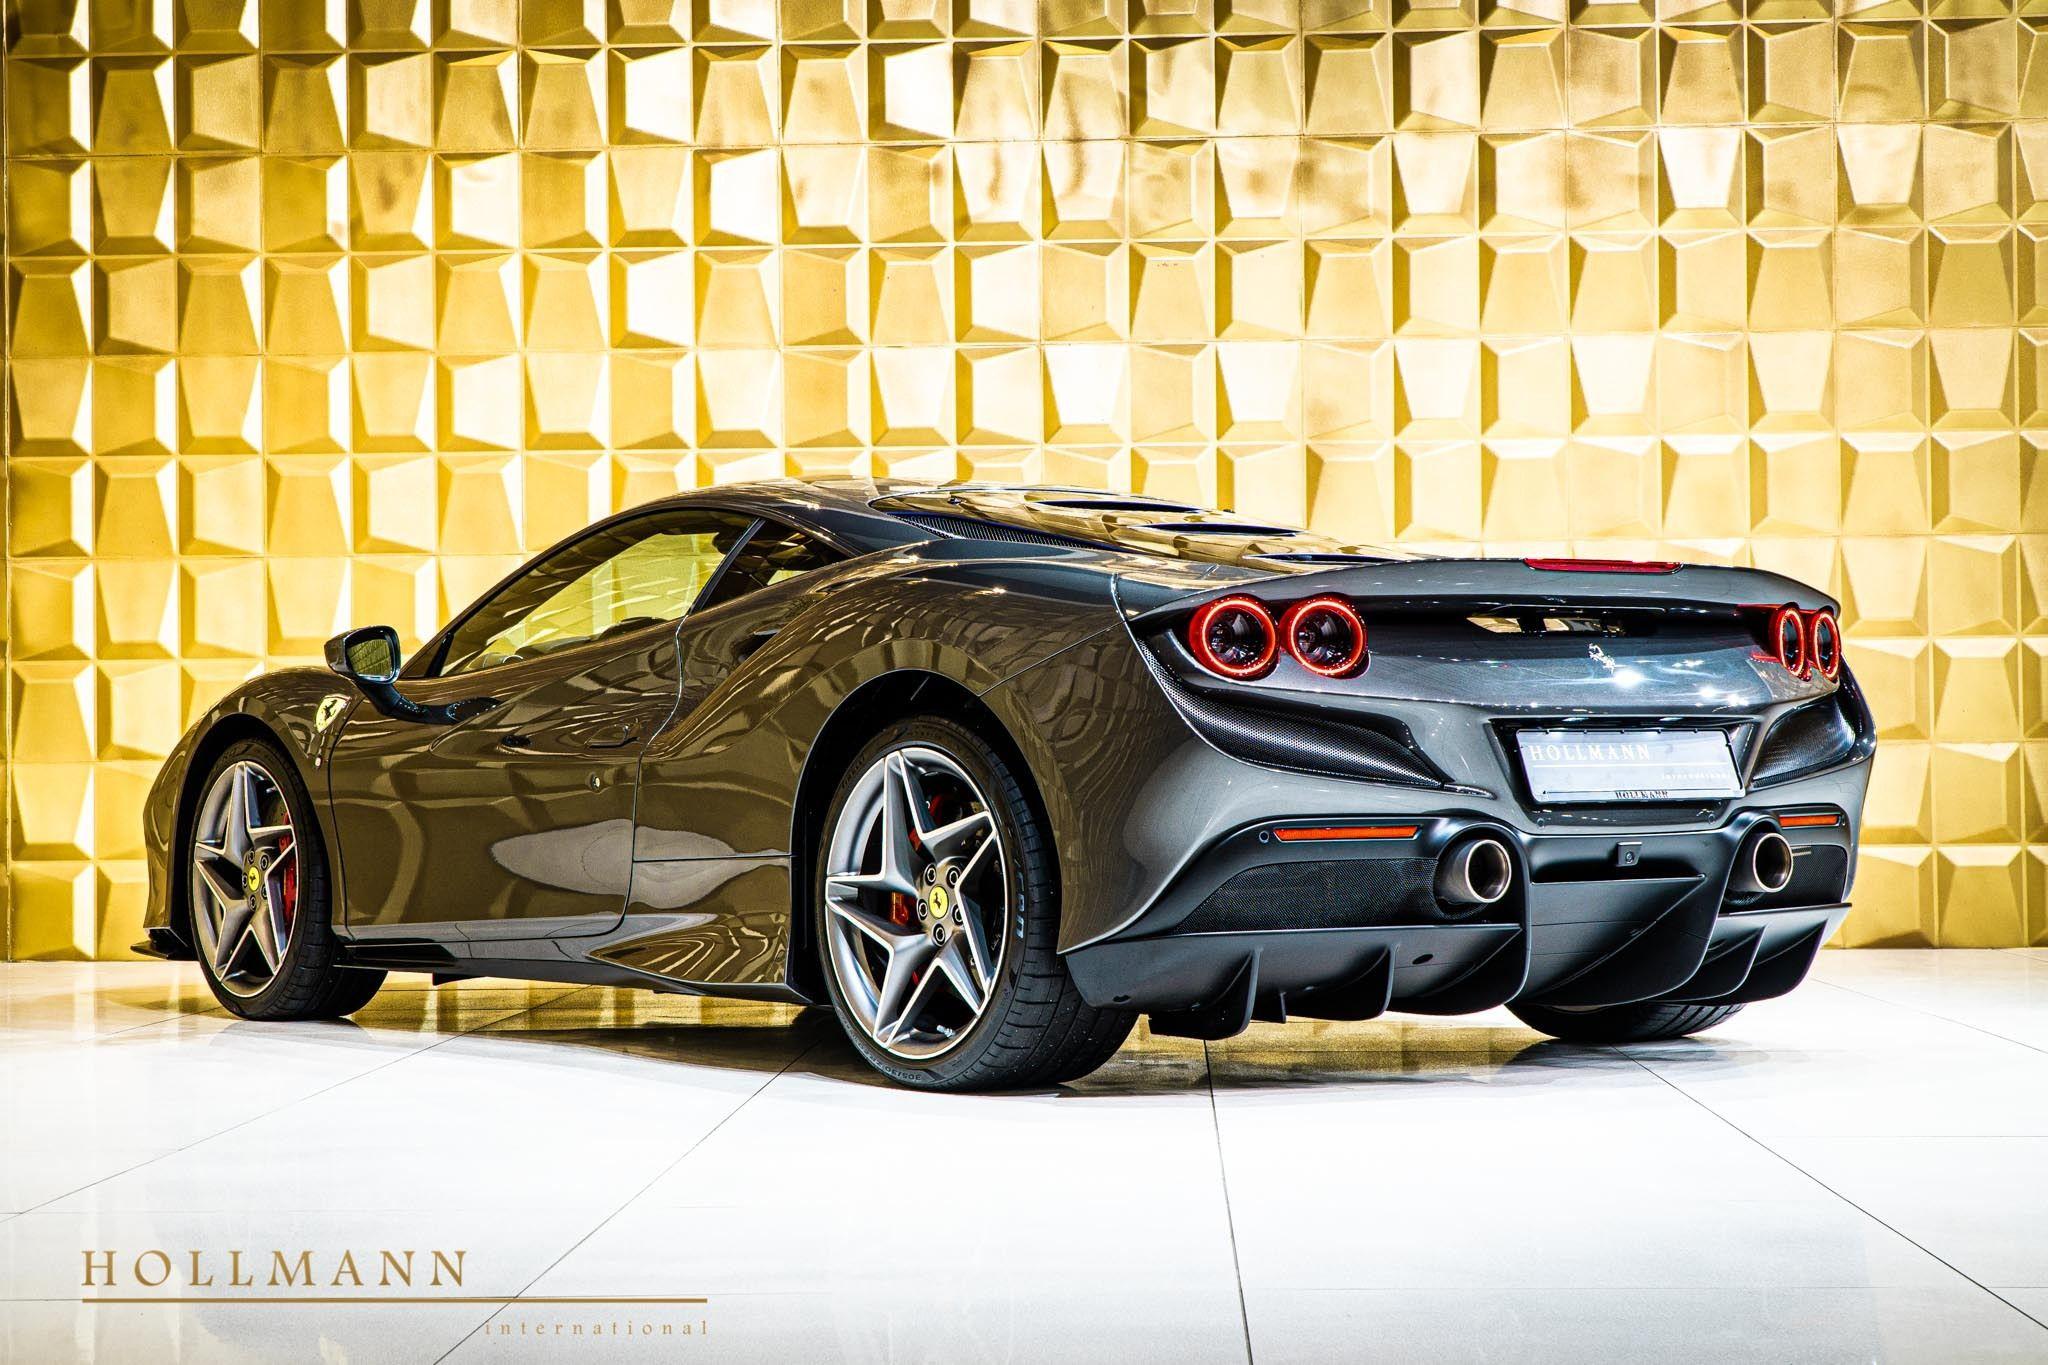 Ferrari F8 Tributo In 2020 Ferrari Racing Seats New Ferrari